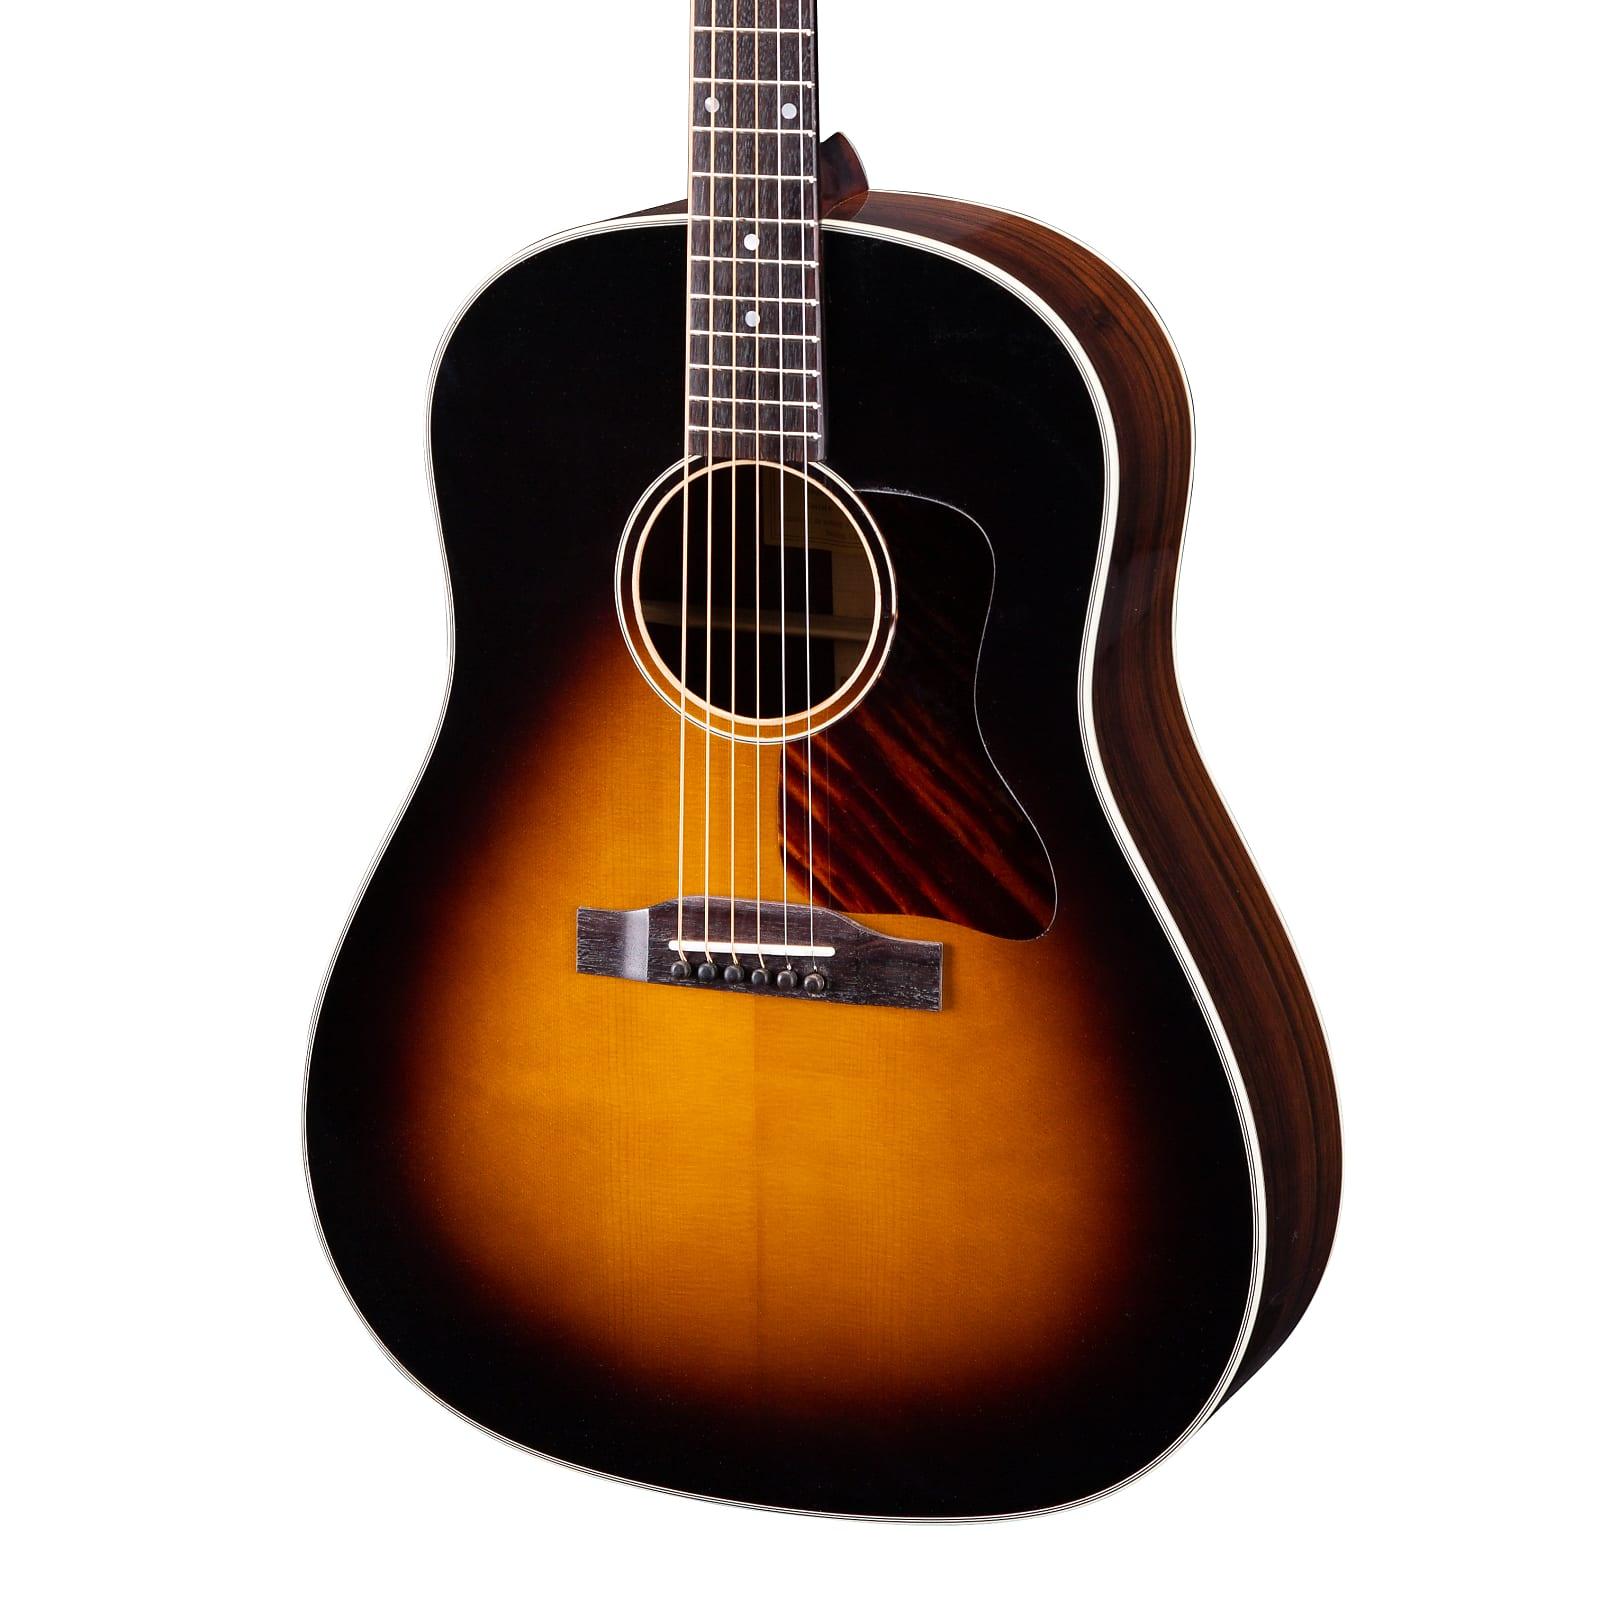 Eastman E20SS Slope Shoulder Dreadnought Acoustic Guitar Sunburst w/ Hard Case